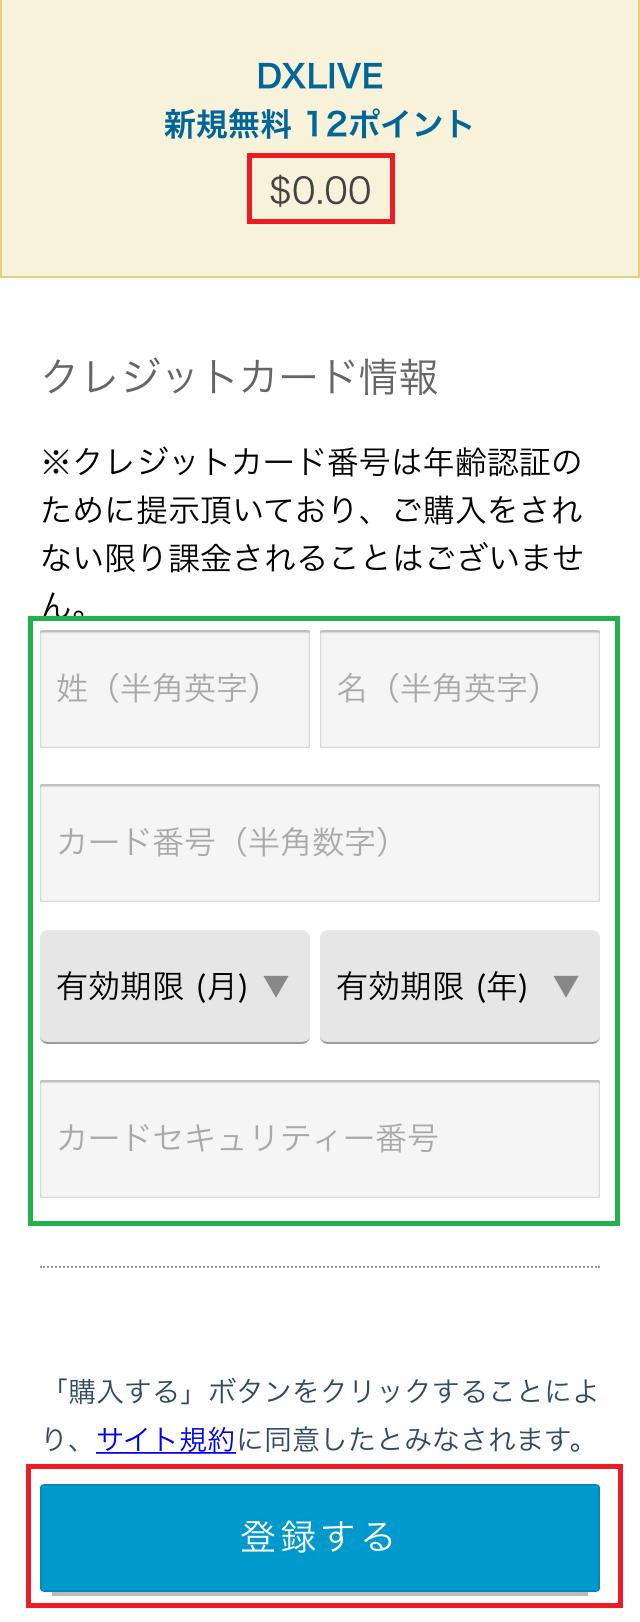 DXLIVE登録手順